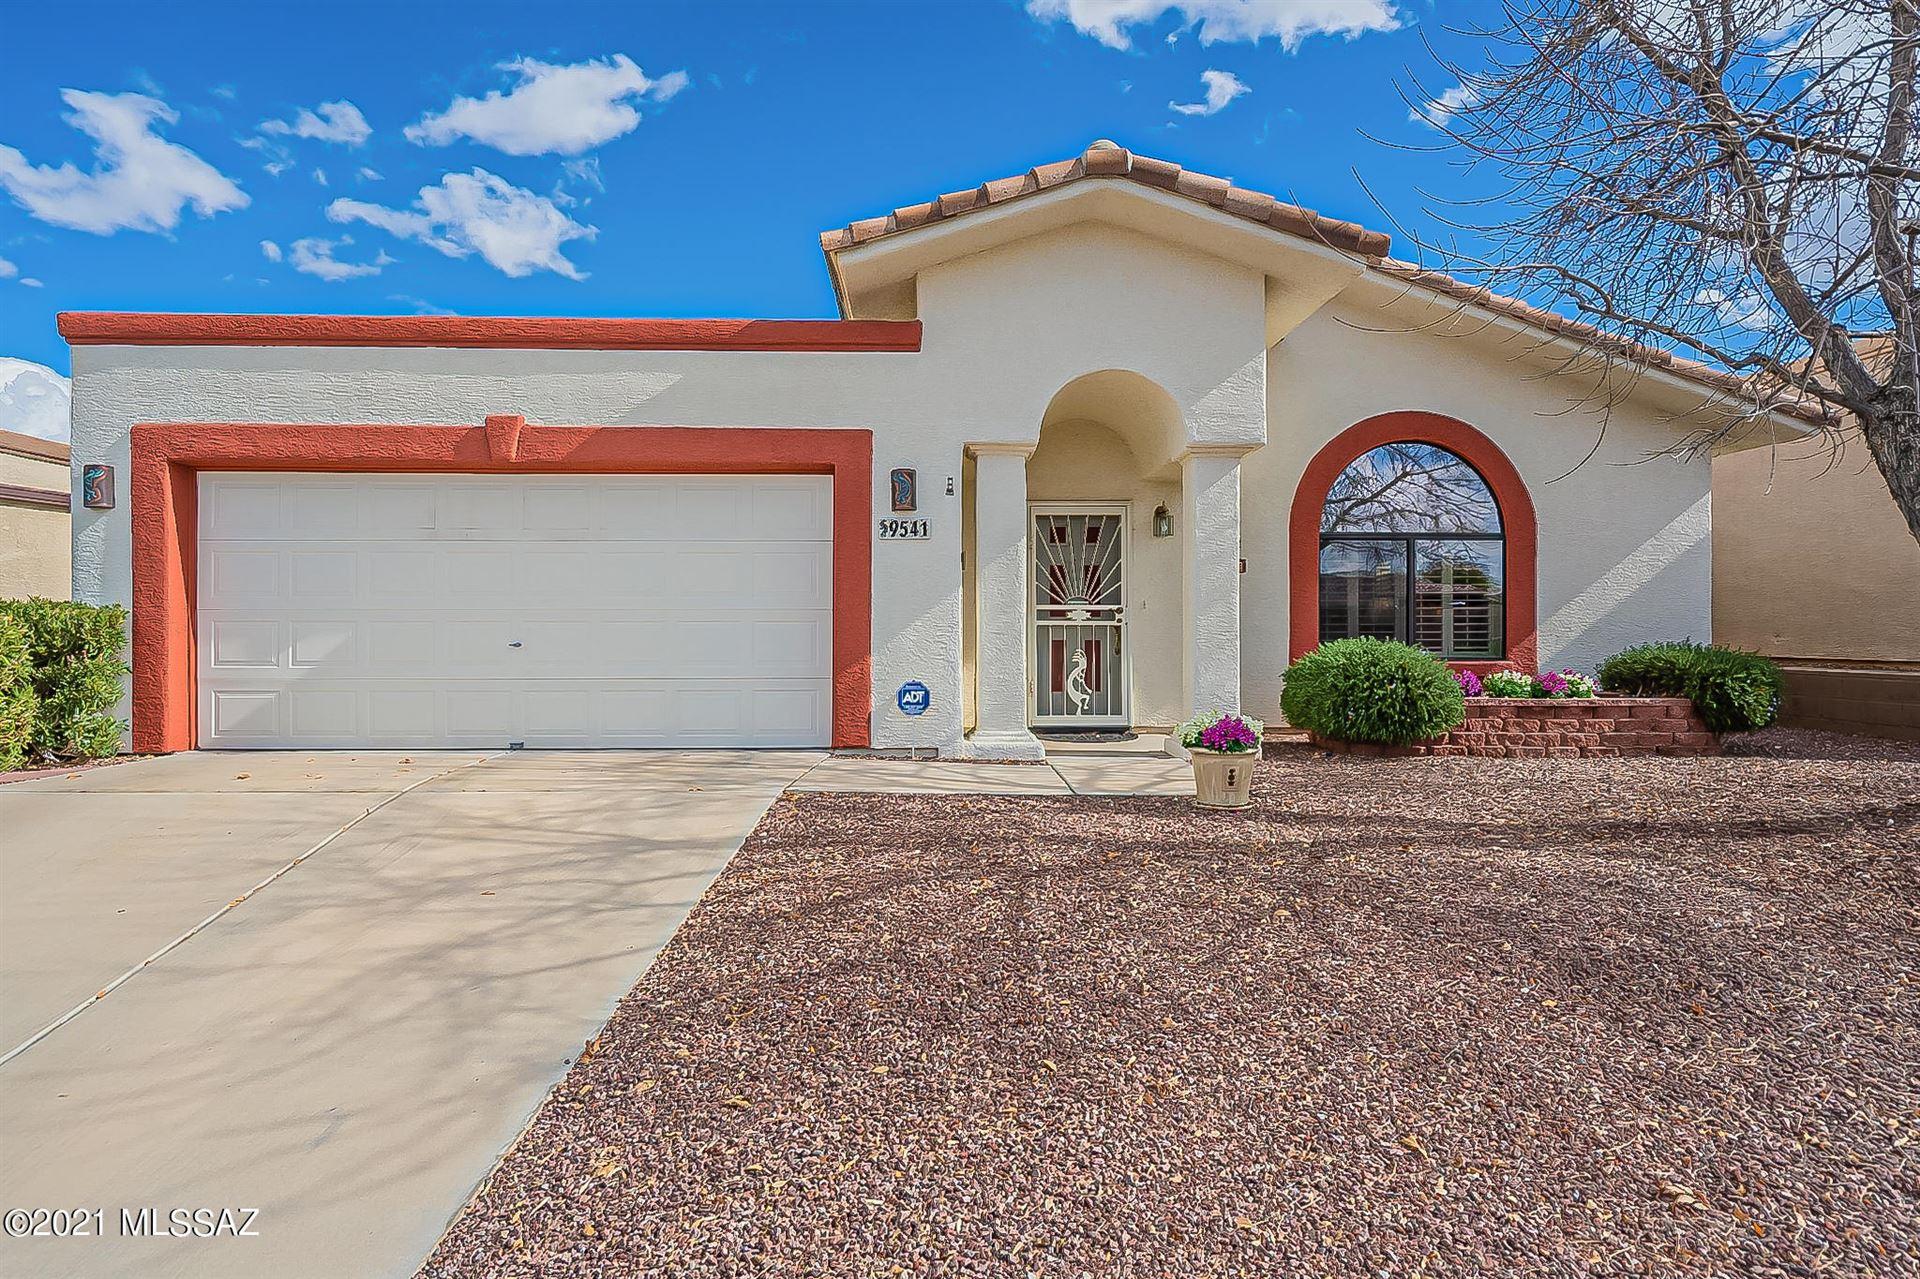 9541 E Kokopelli Circle, Tucson, AZ 85748 - MLS#: 22102158